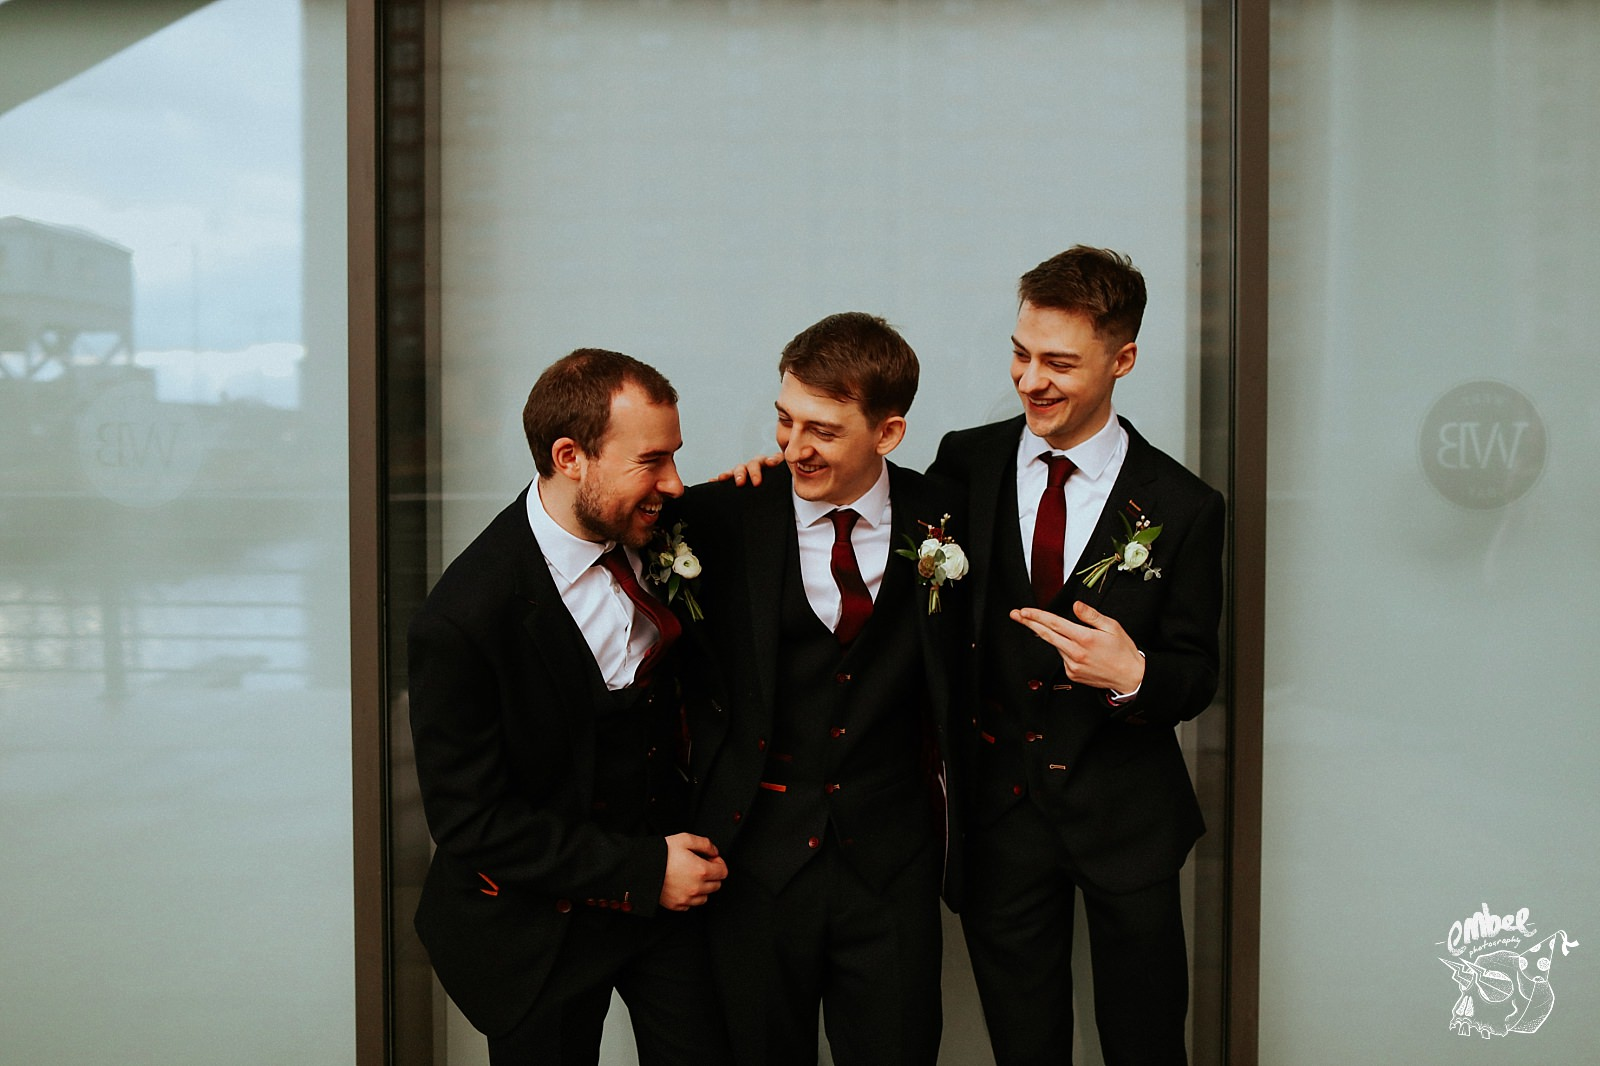 groom with ushers joking around